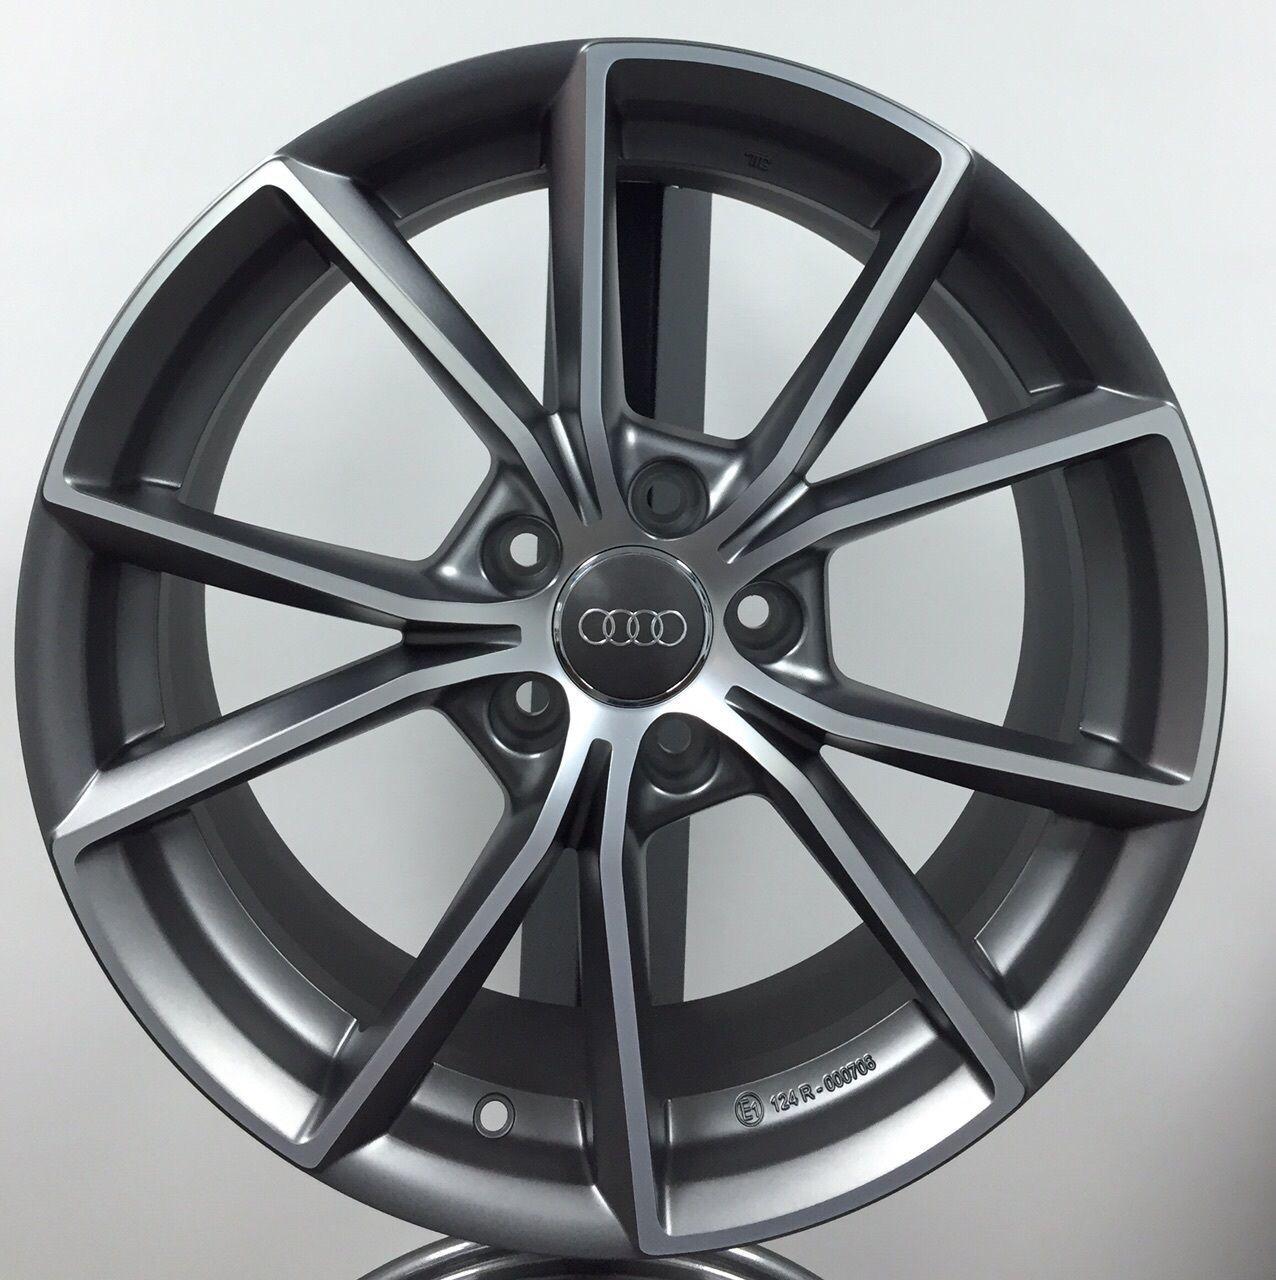 "Cerchi in lega Audi A3 A4 A6 Q3 Q5 da 17"" Nuovi S Line MM035 Omologati Ece Nad | eBay"